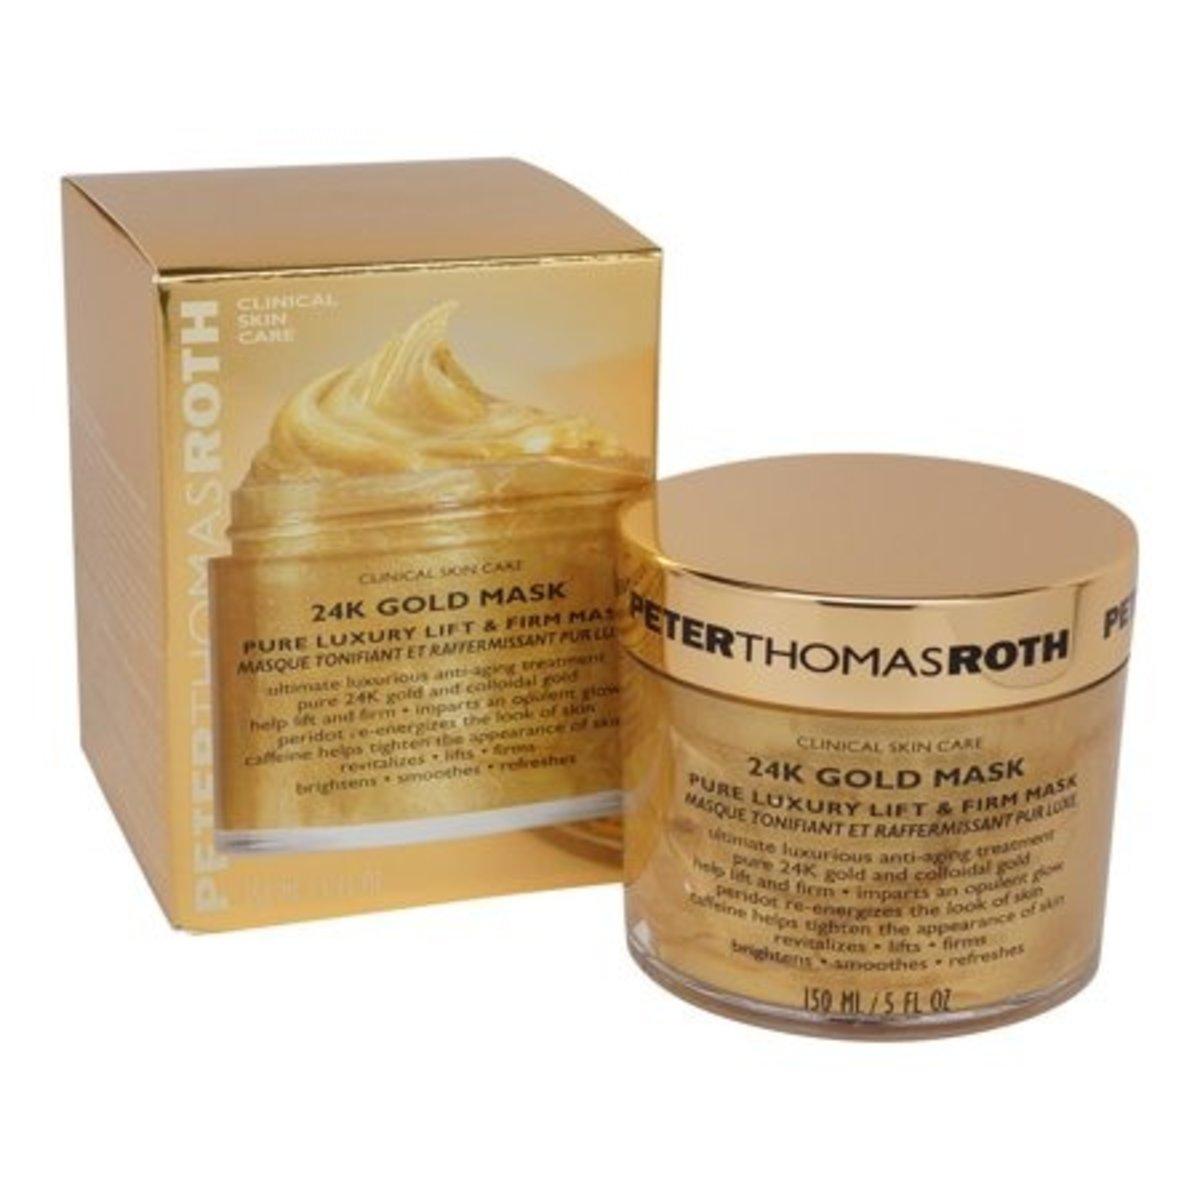 Peter Thomas Roth - 24K Gold Mask 150ml